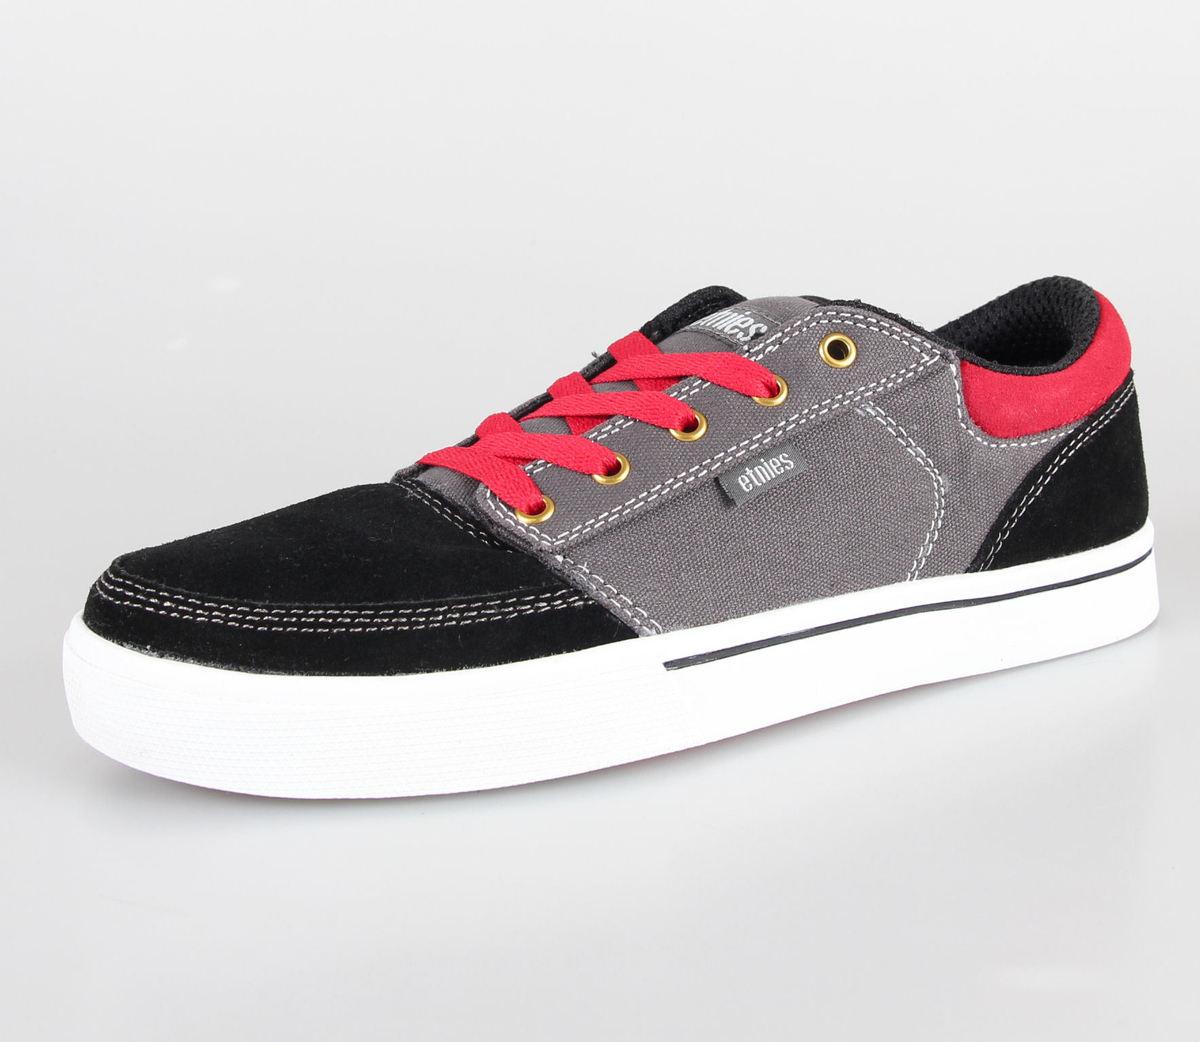 boty pánské ETNIES - Brake - Black/Grey/Red